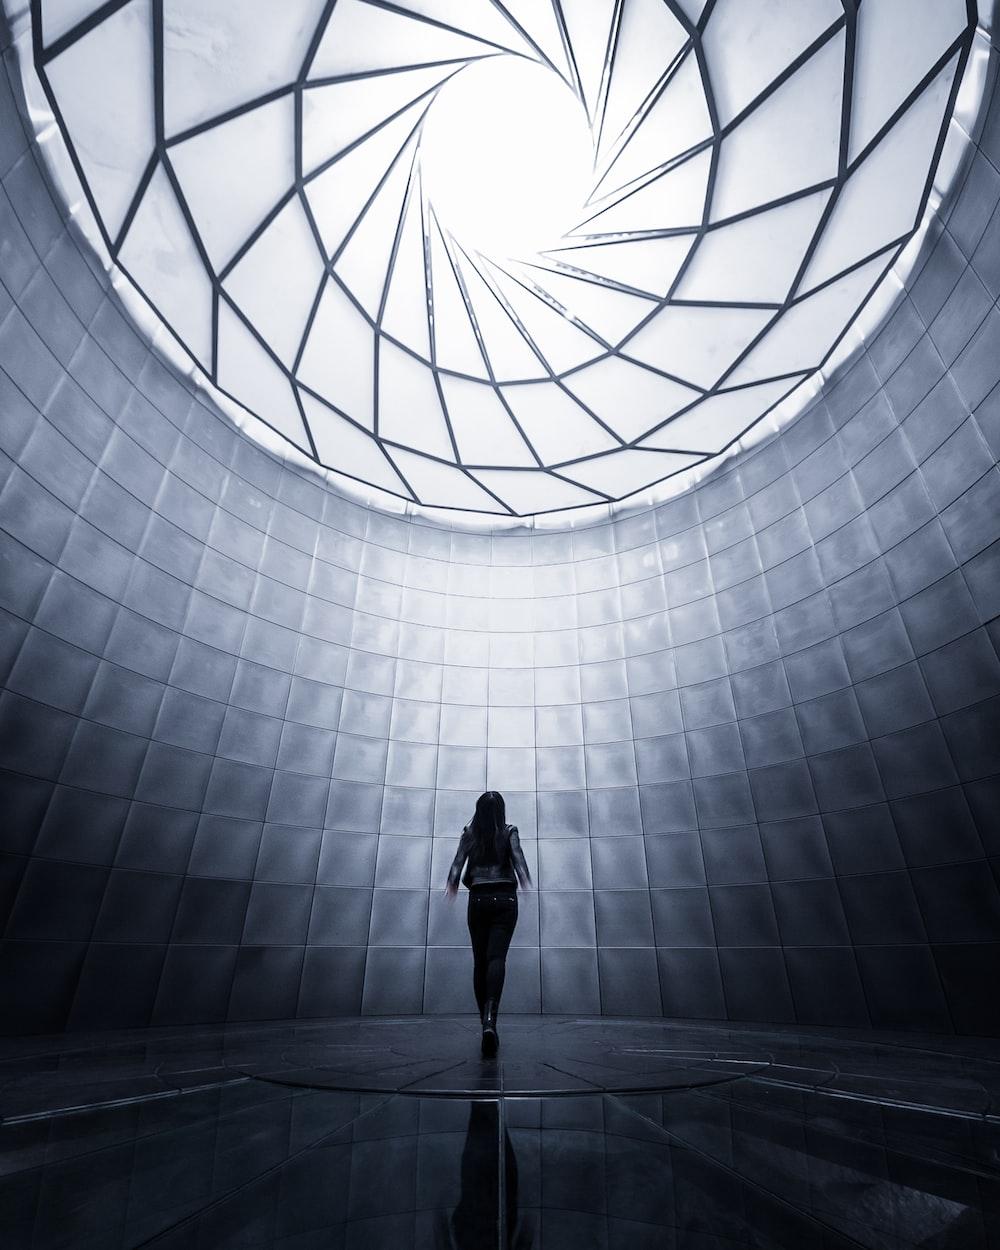 woman wearing black shirt facing the ceiling